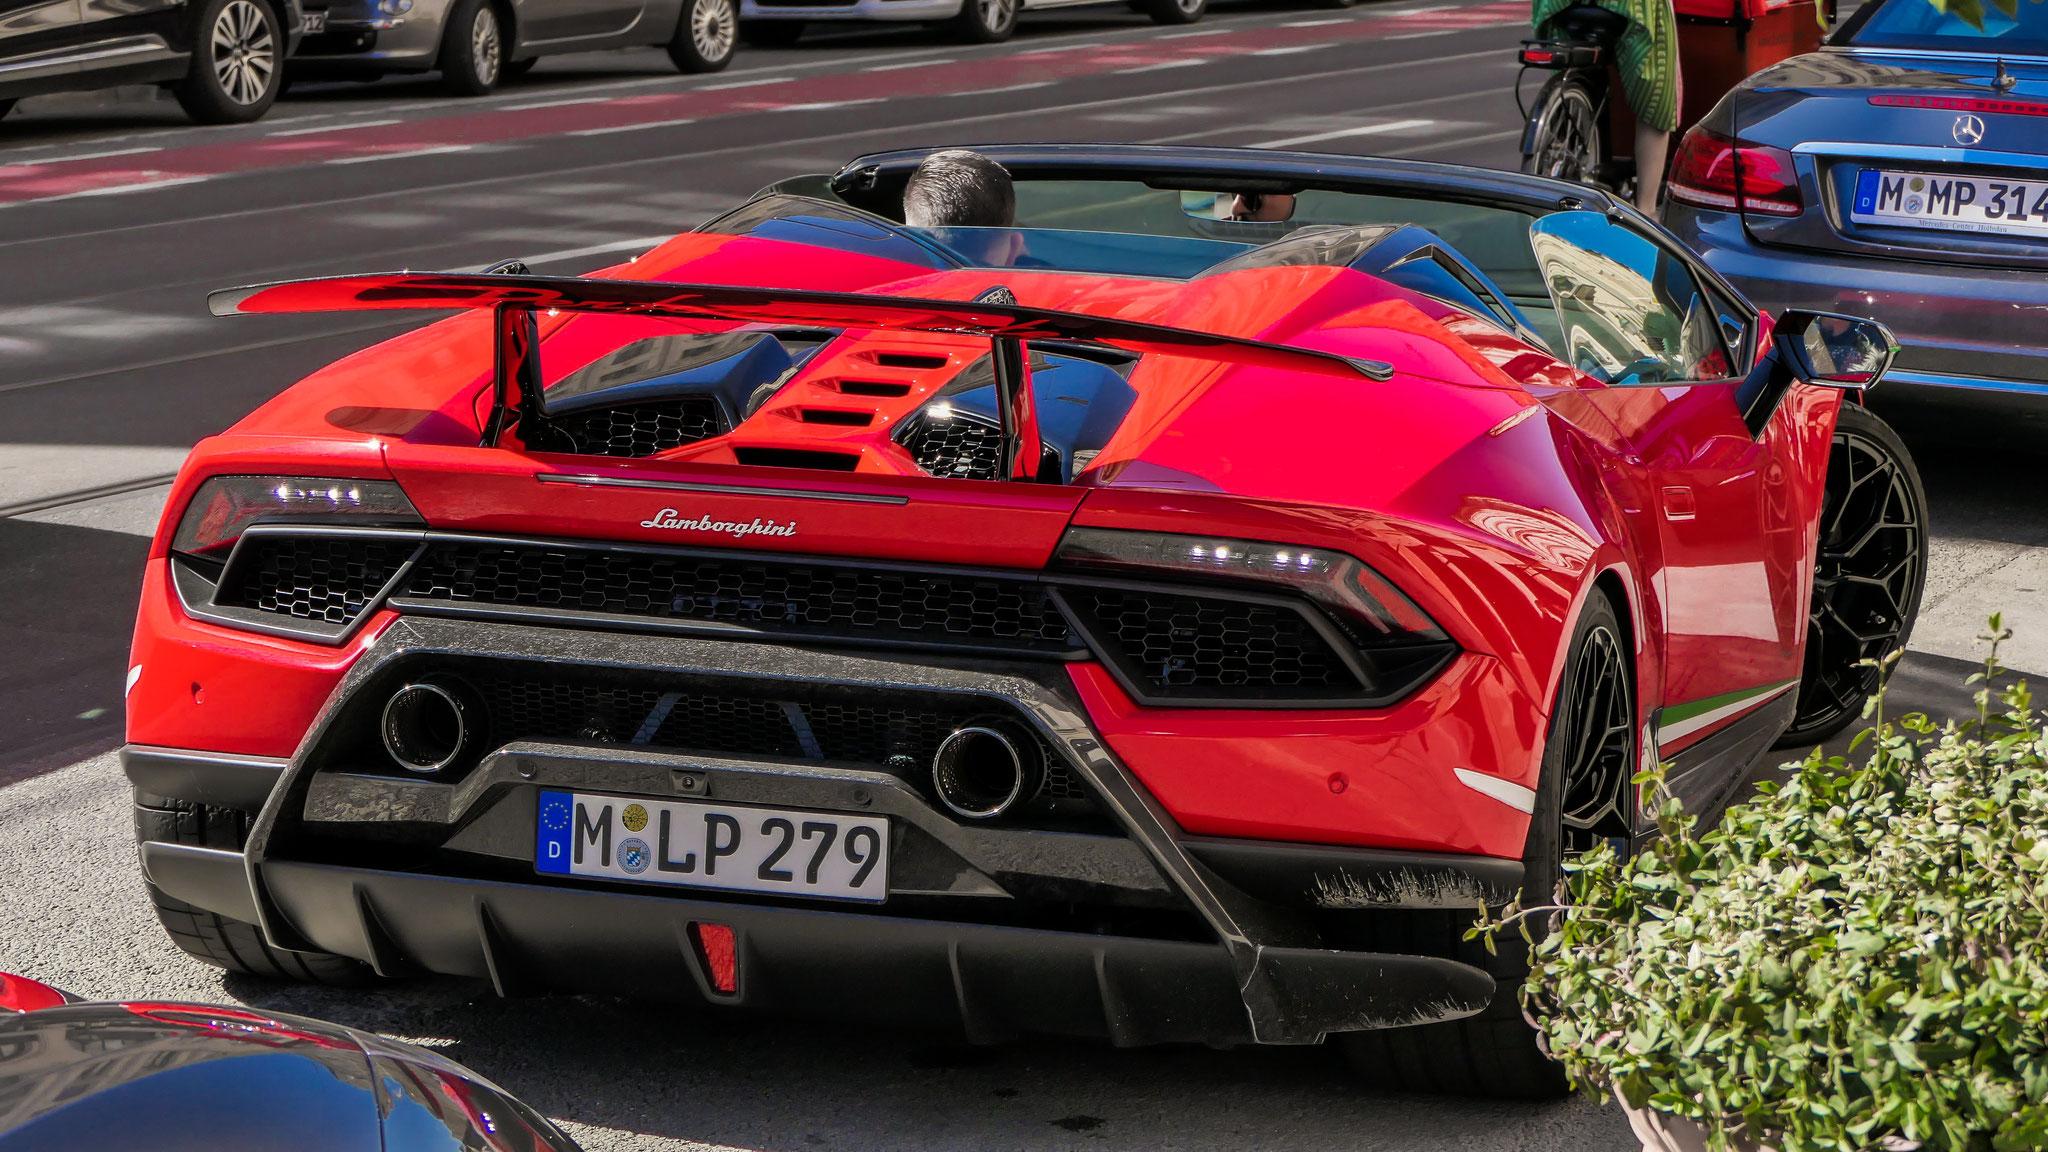 Lamborghini Huracan Performante Spyder - M-LP-279